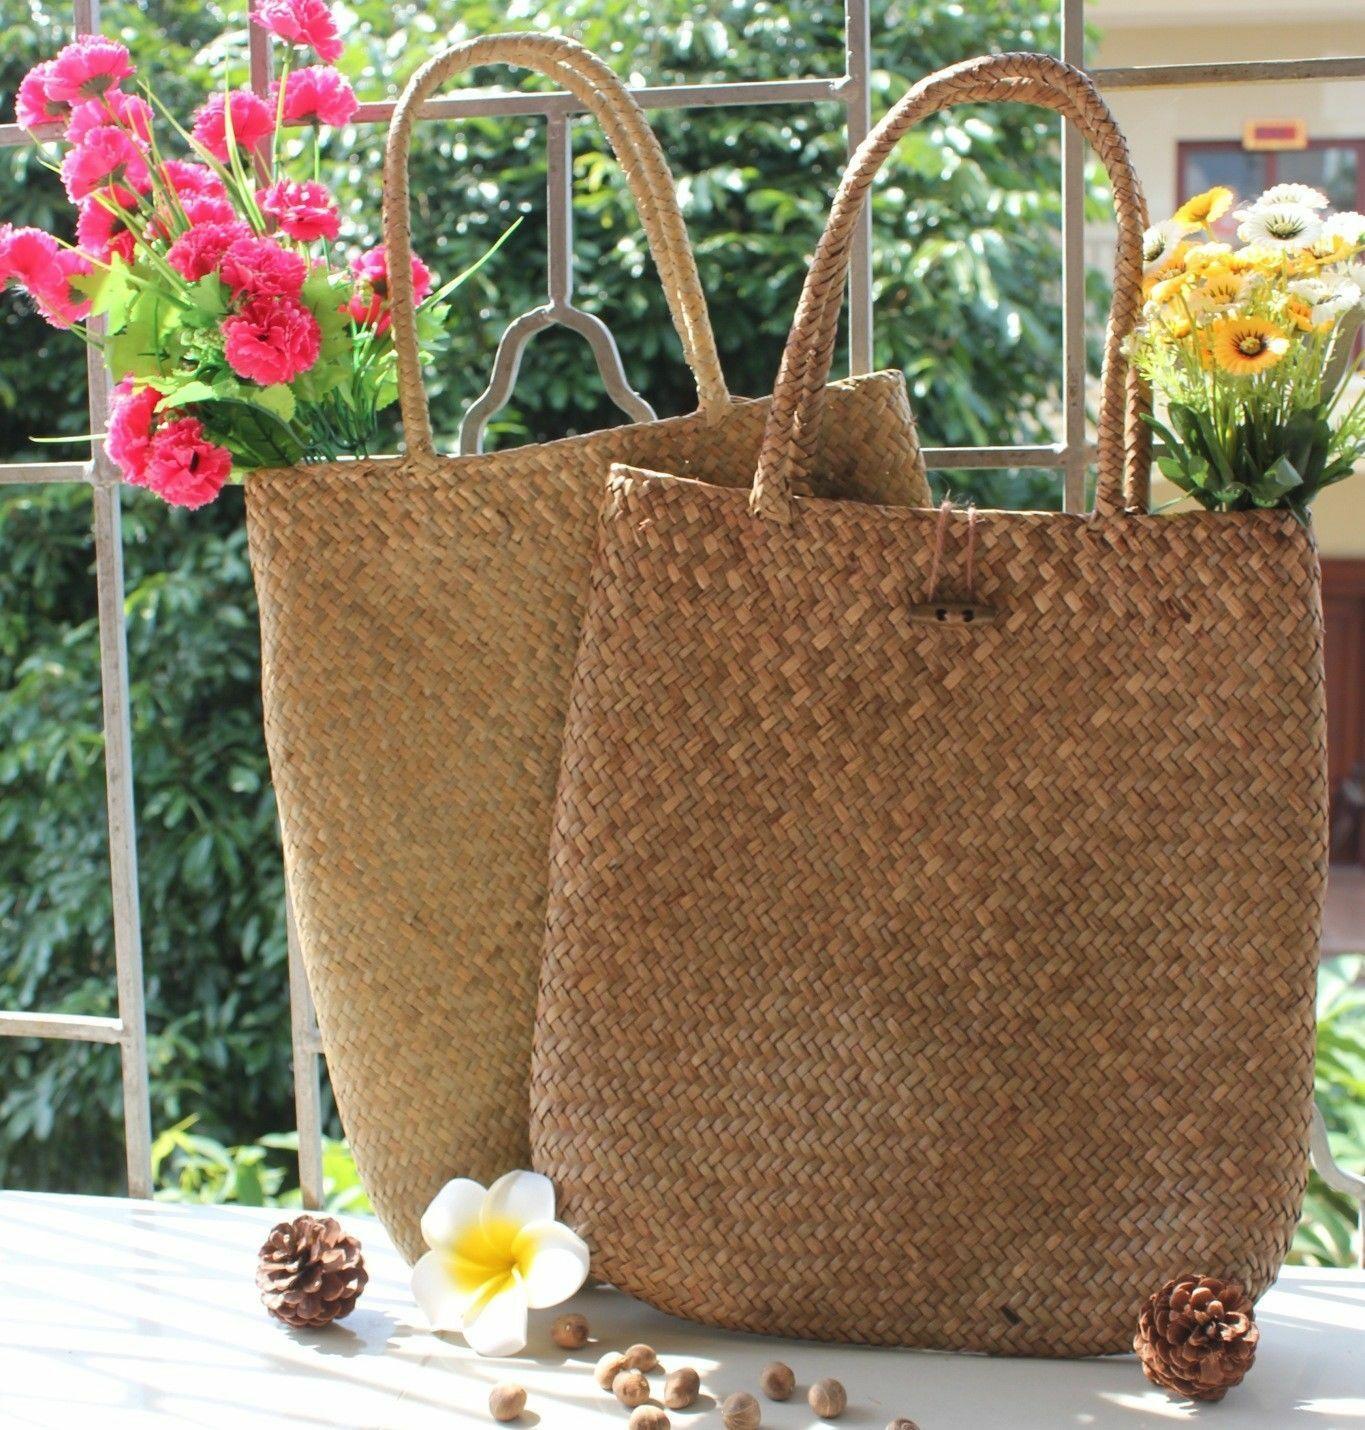 New  Women Straw Bag Woven Handbag Purse Crossbody Boho Beach Summer Bags